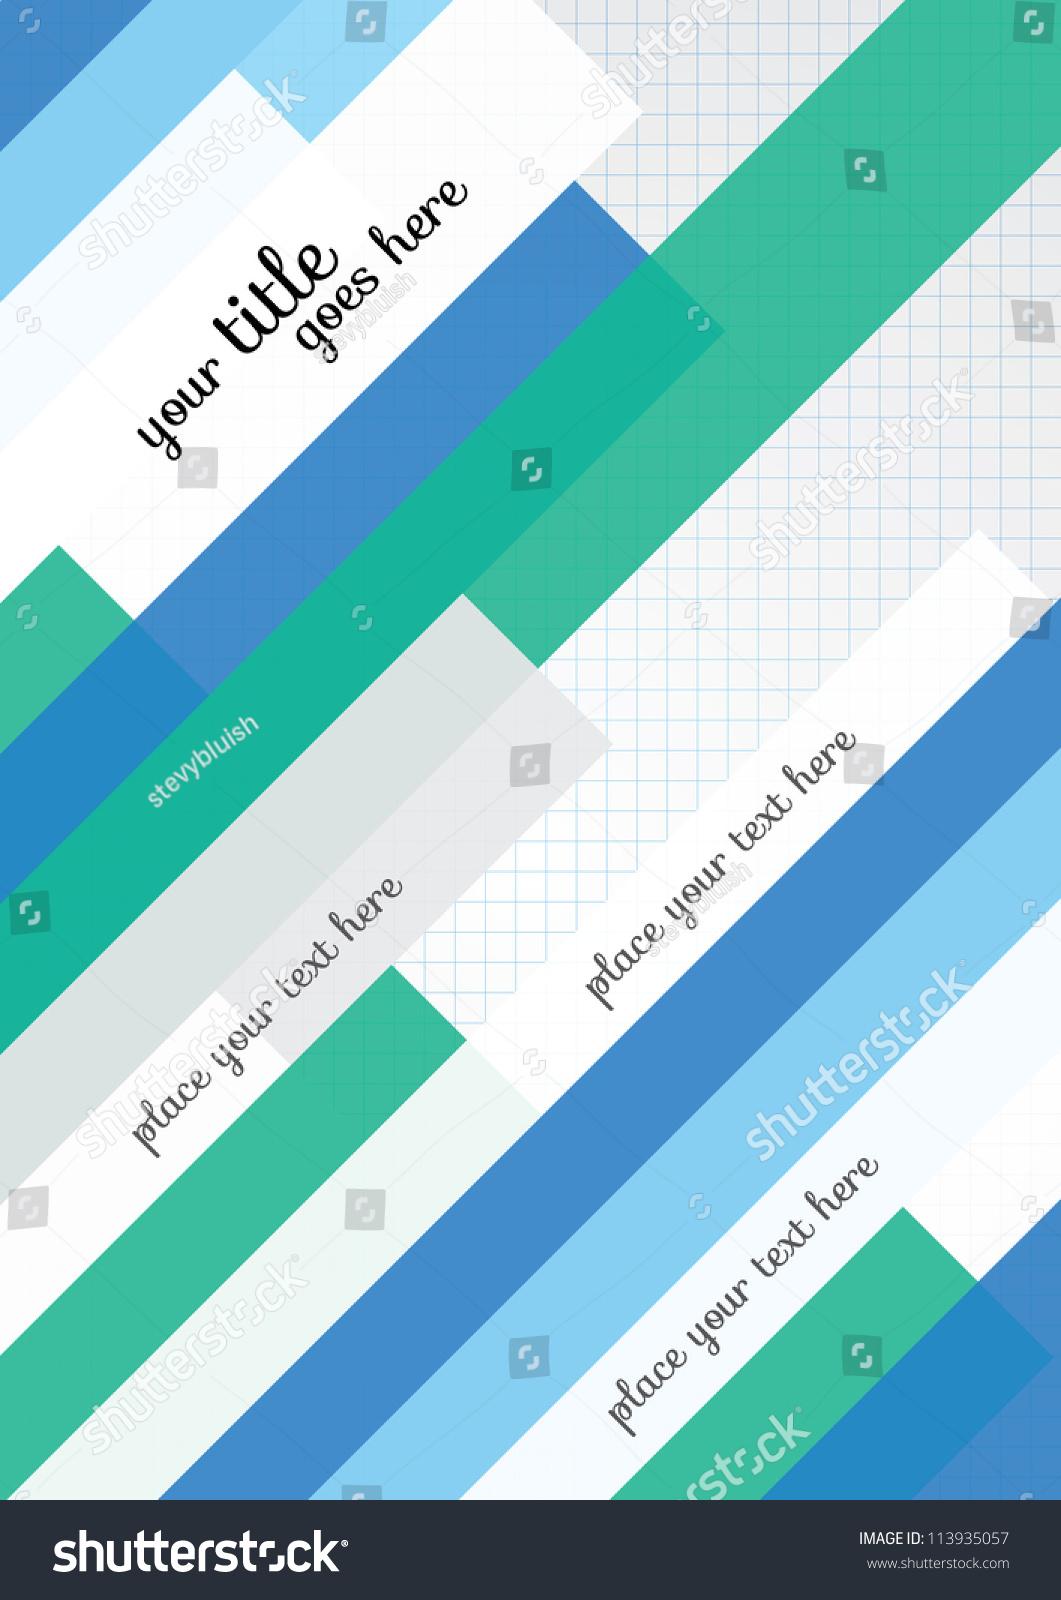 Poster design template - Print Vector Poster Design Template Layout Design Background